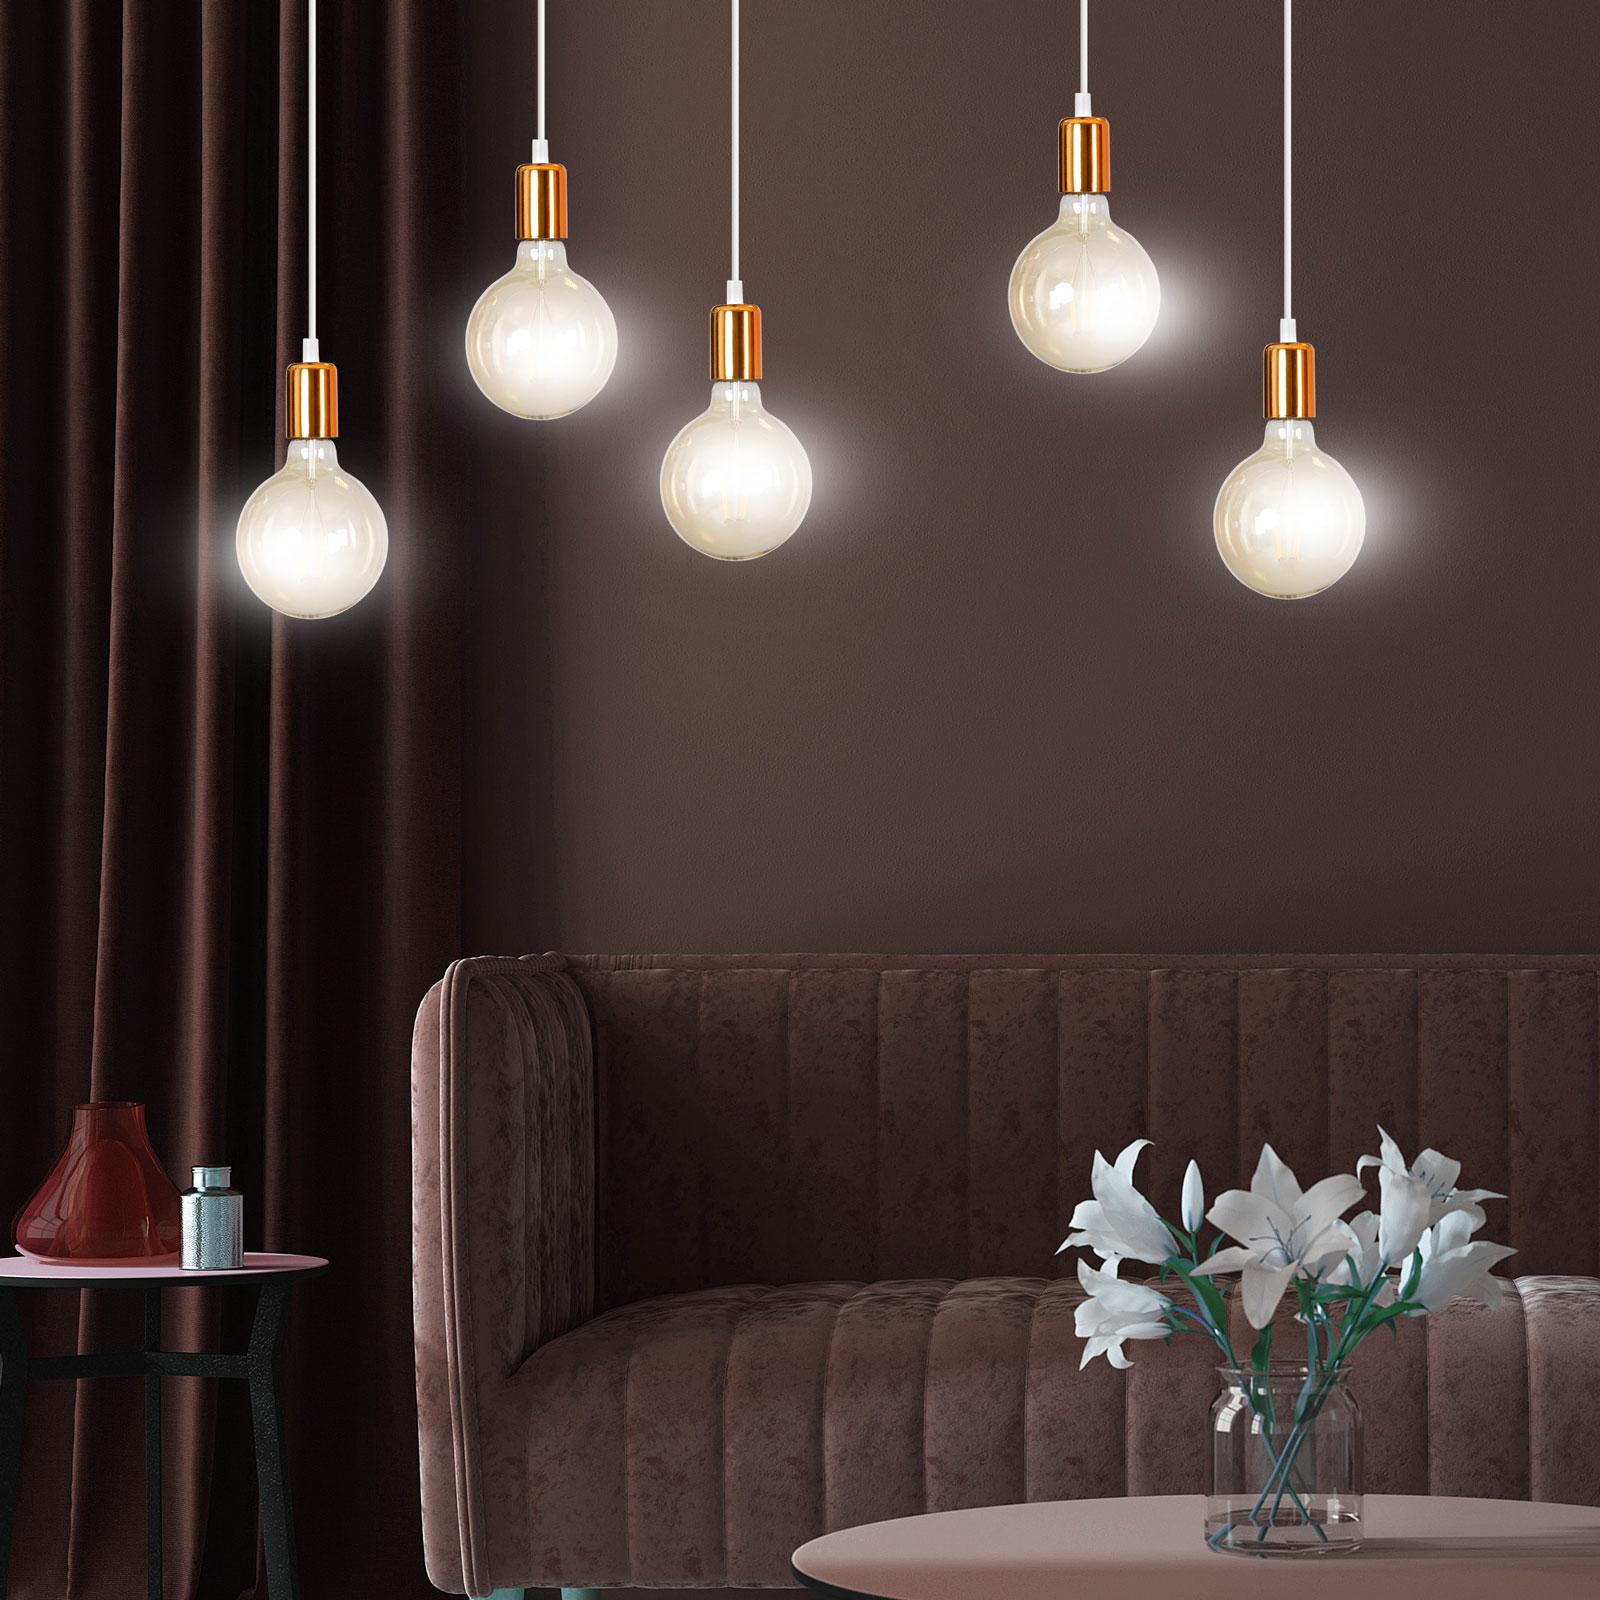 Hanglamp Spark 5 5-lamps in wit/koper